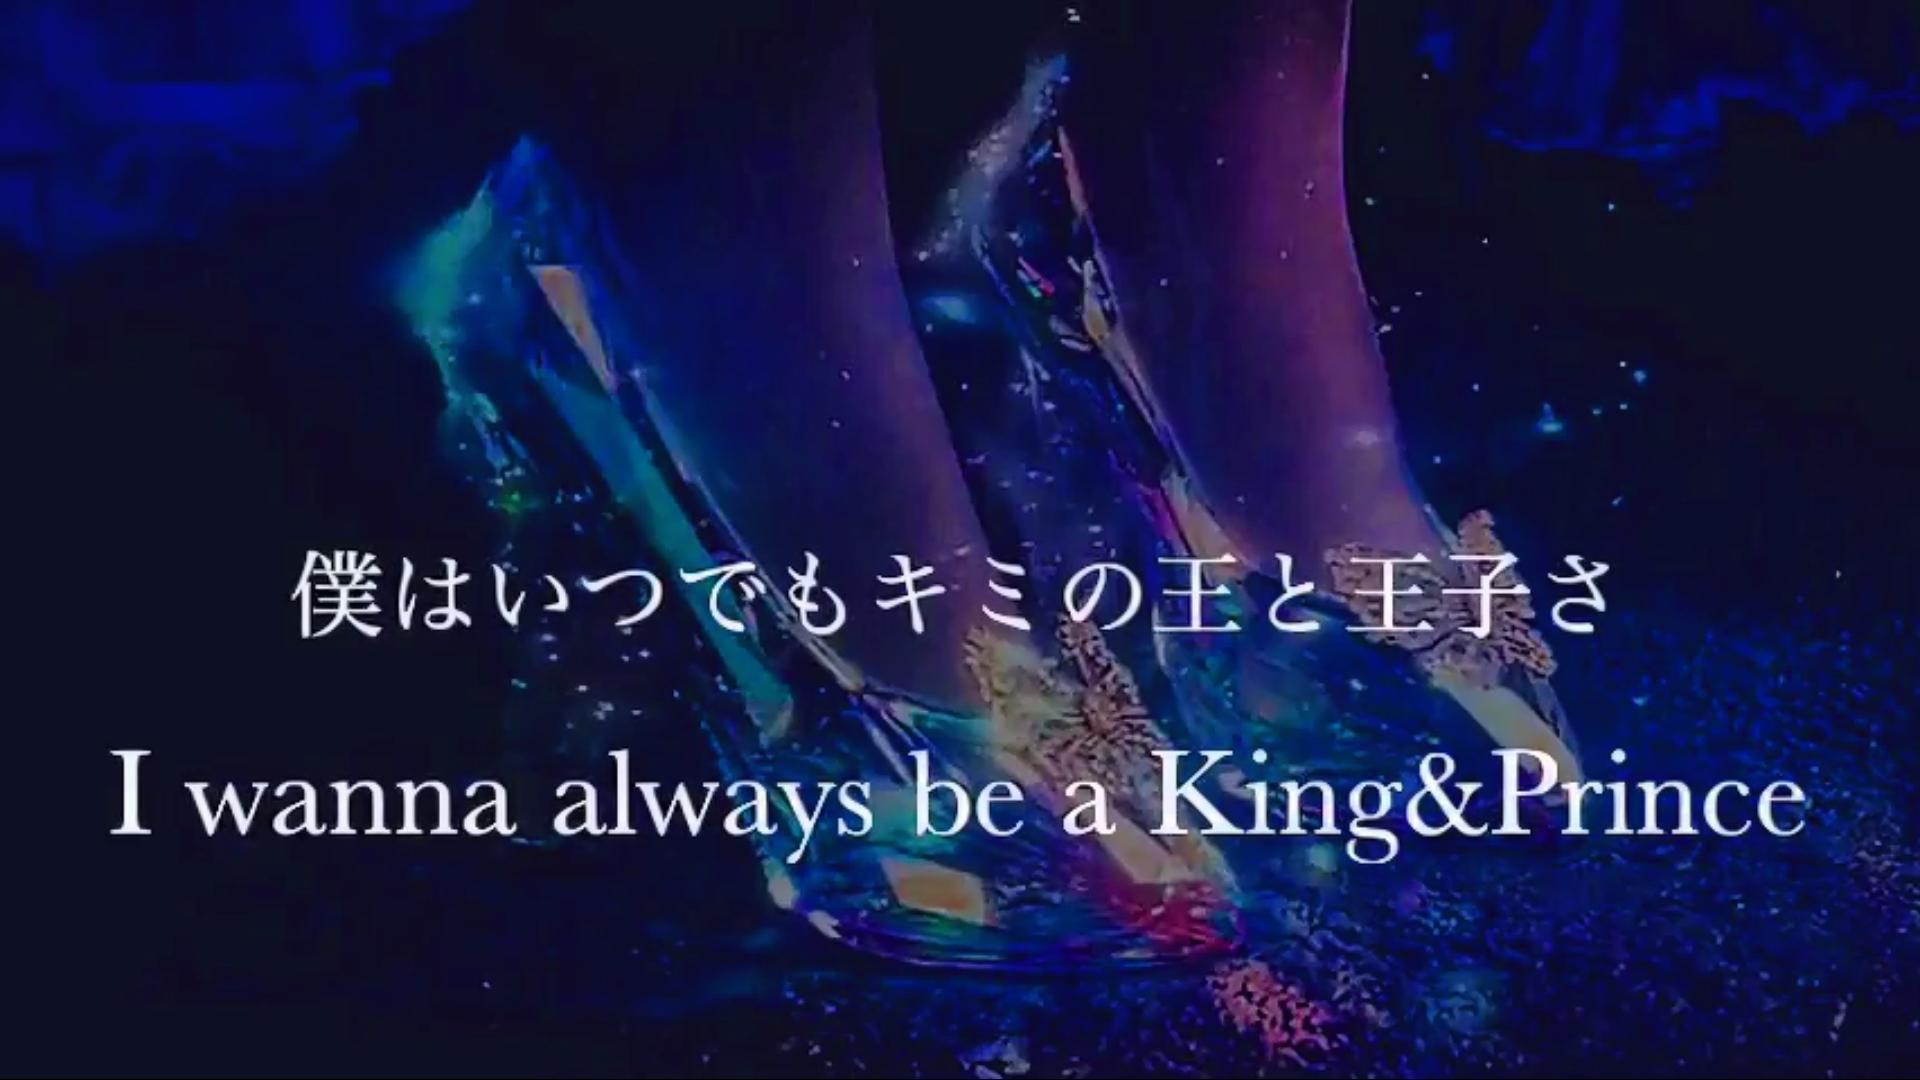 King & Princeが好きな人!